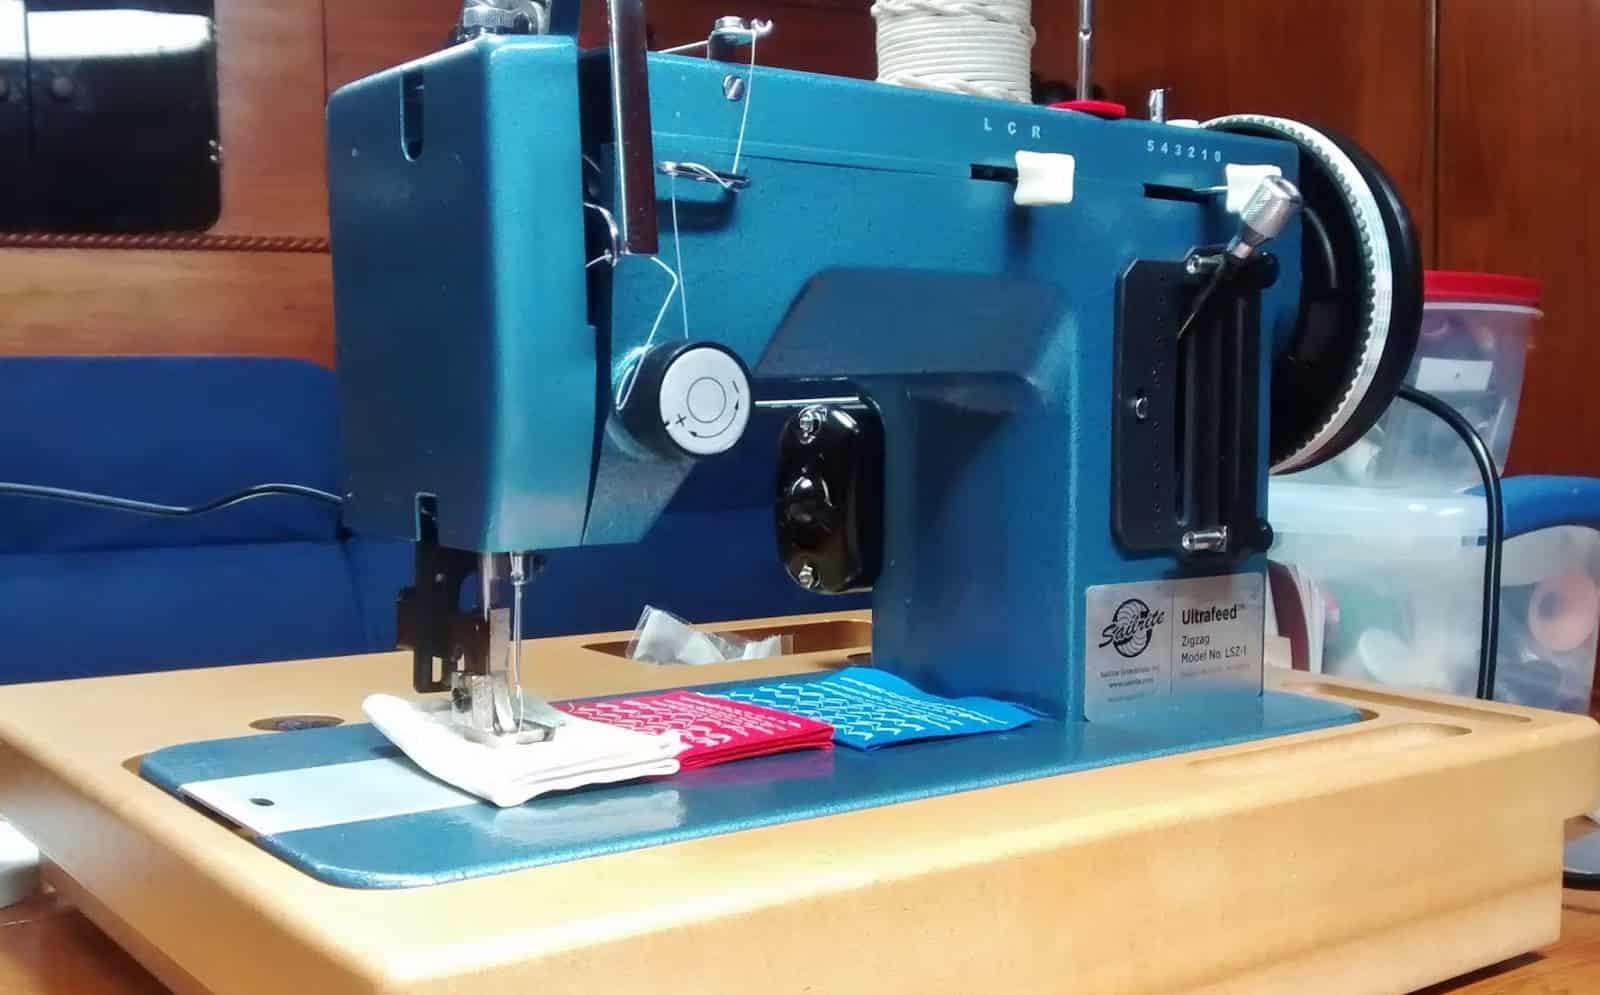 Sailrite LSZ-1 Heavy Duty Sewing Machine